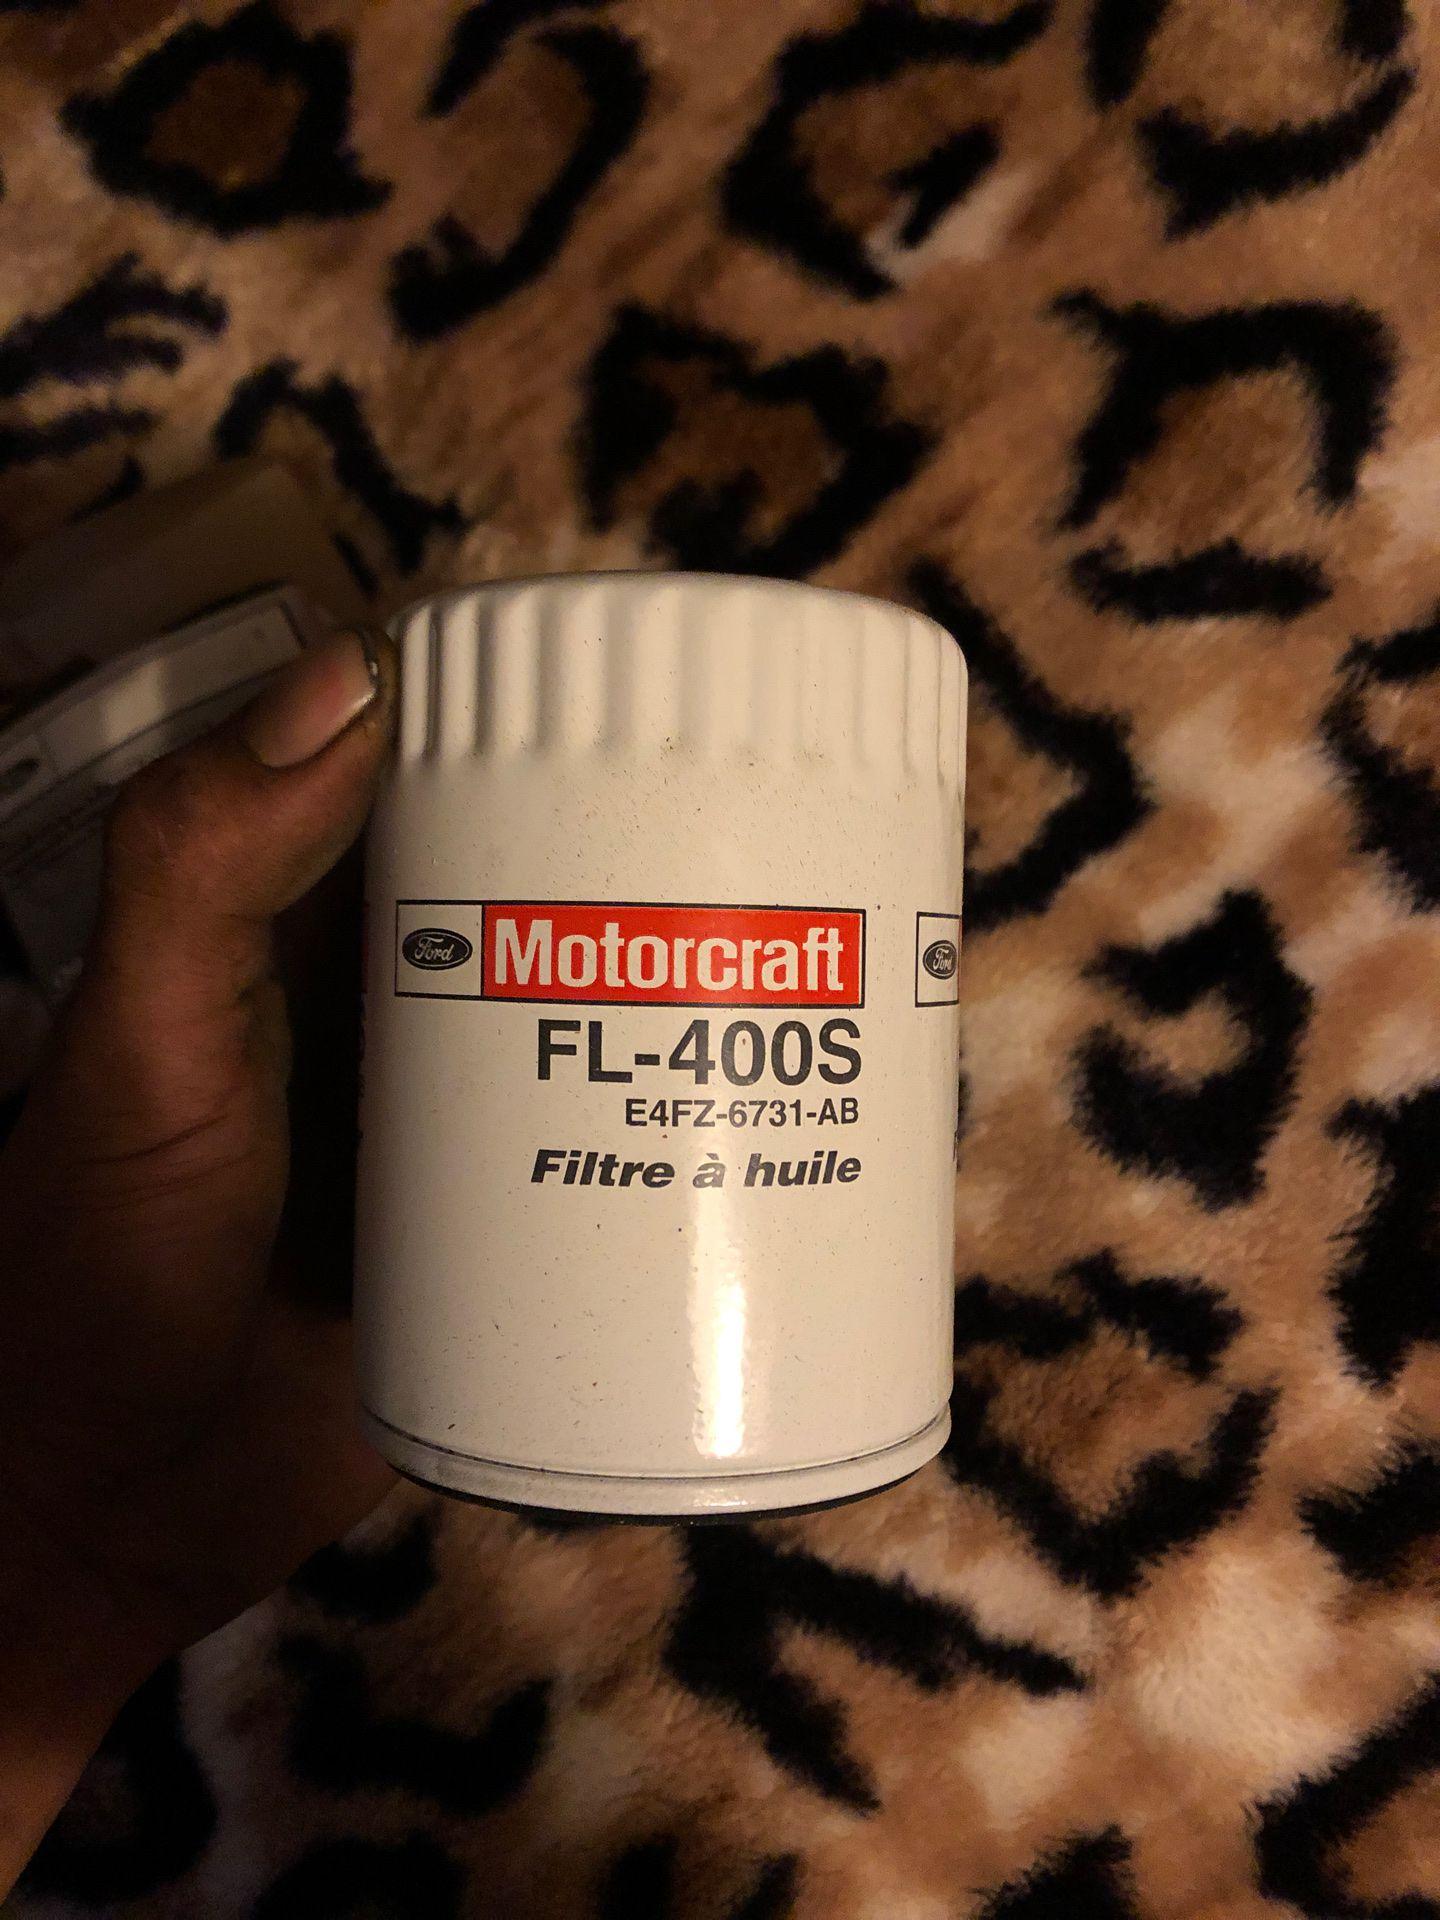 Motorcraft FL - 400S oil filters